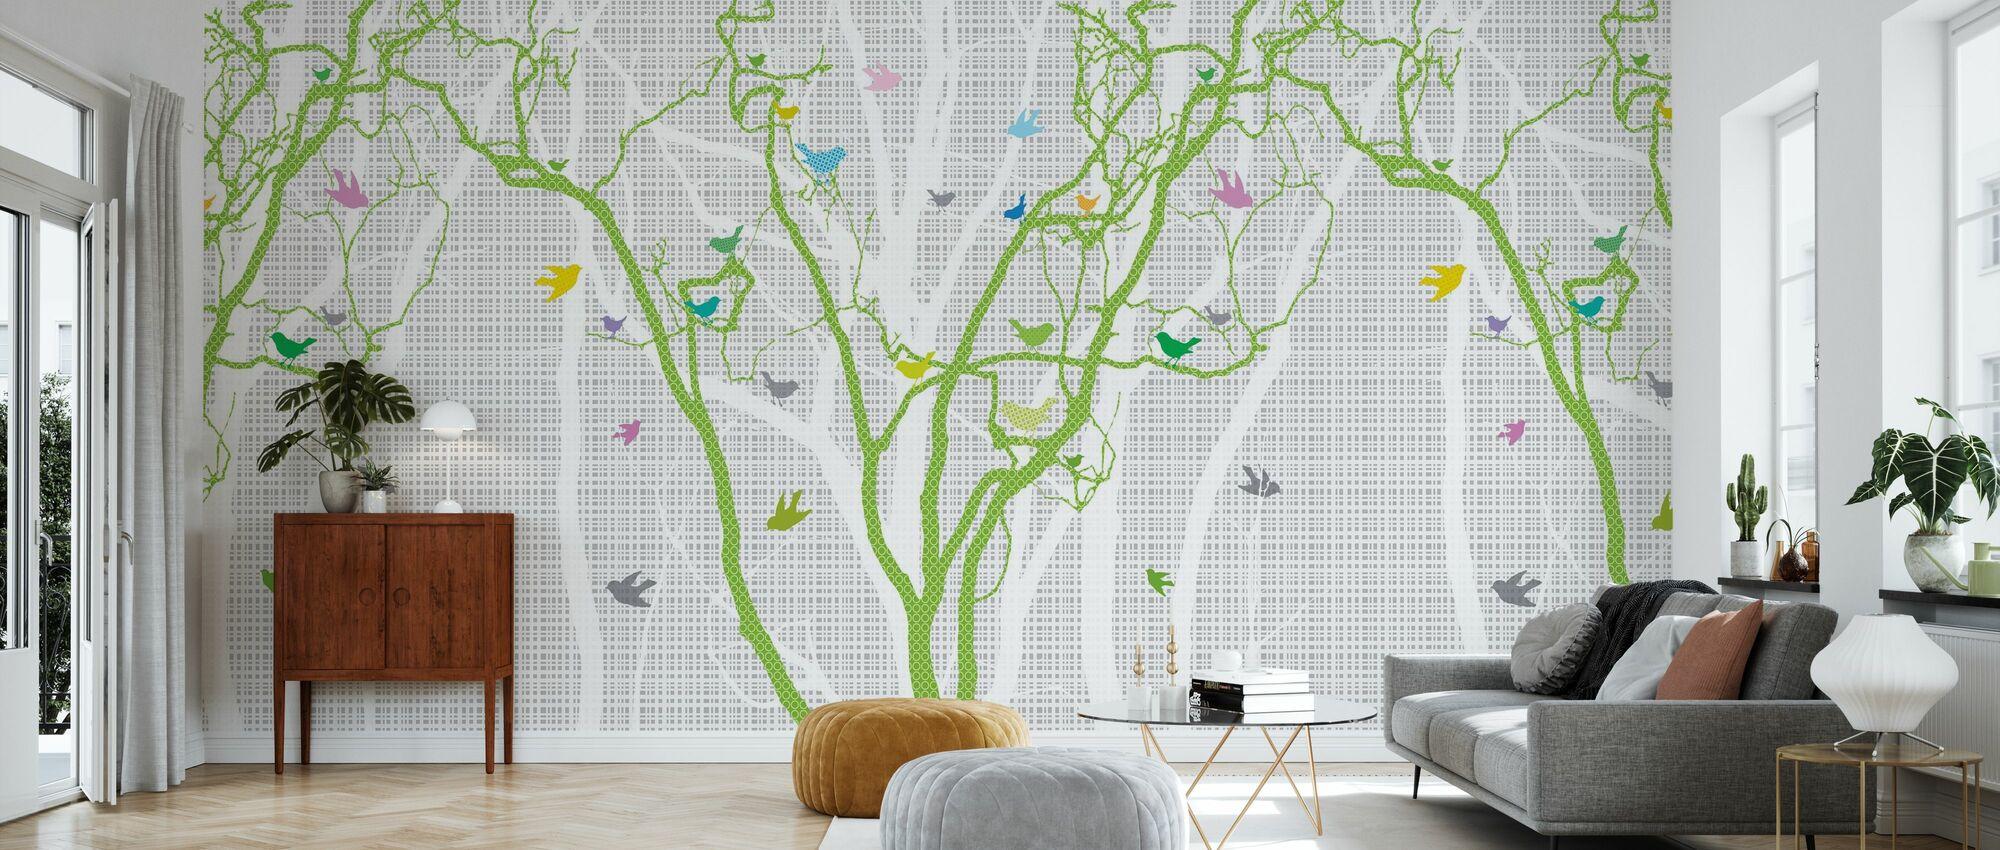 Hide and Seek - Frühlingsgrün - Tapete - Wohnzimmer